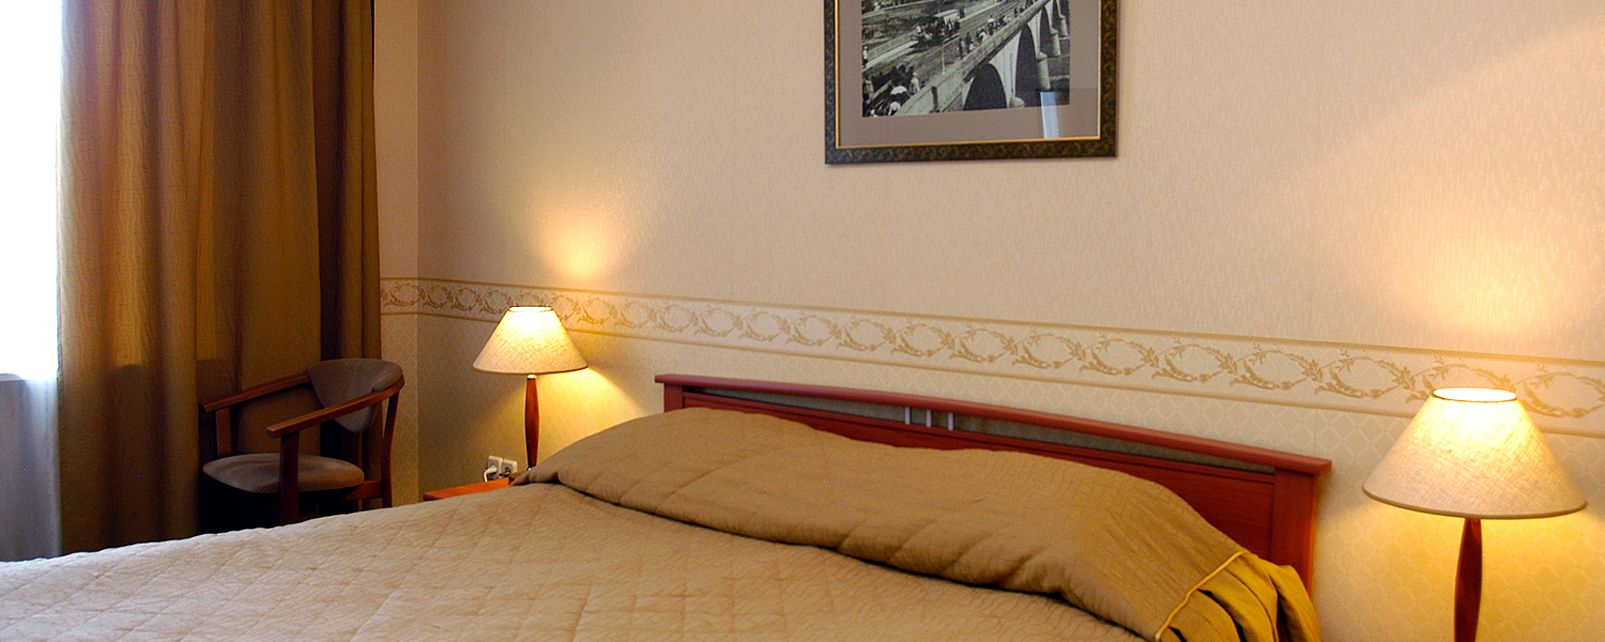 Hotel Arbat House Hotel